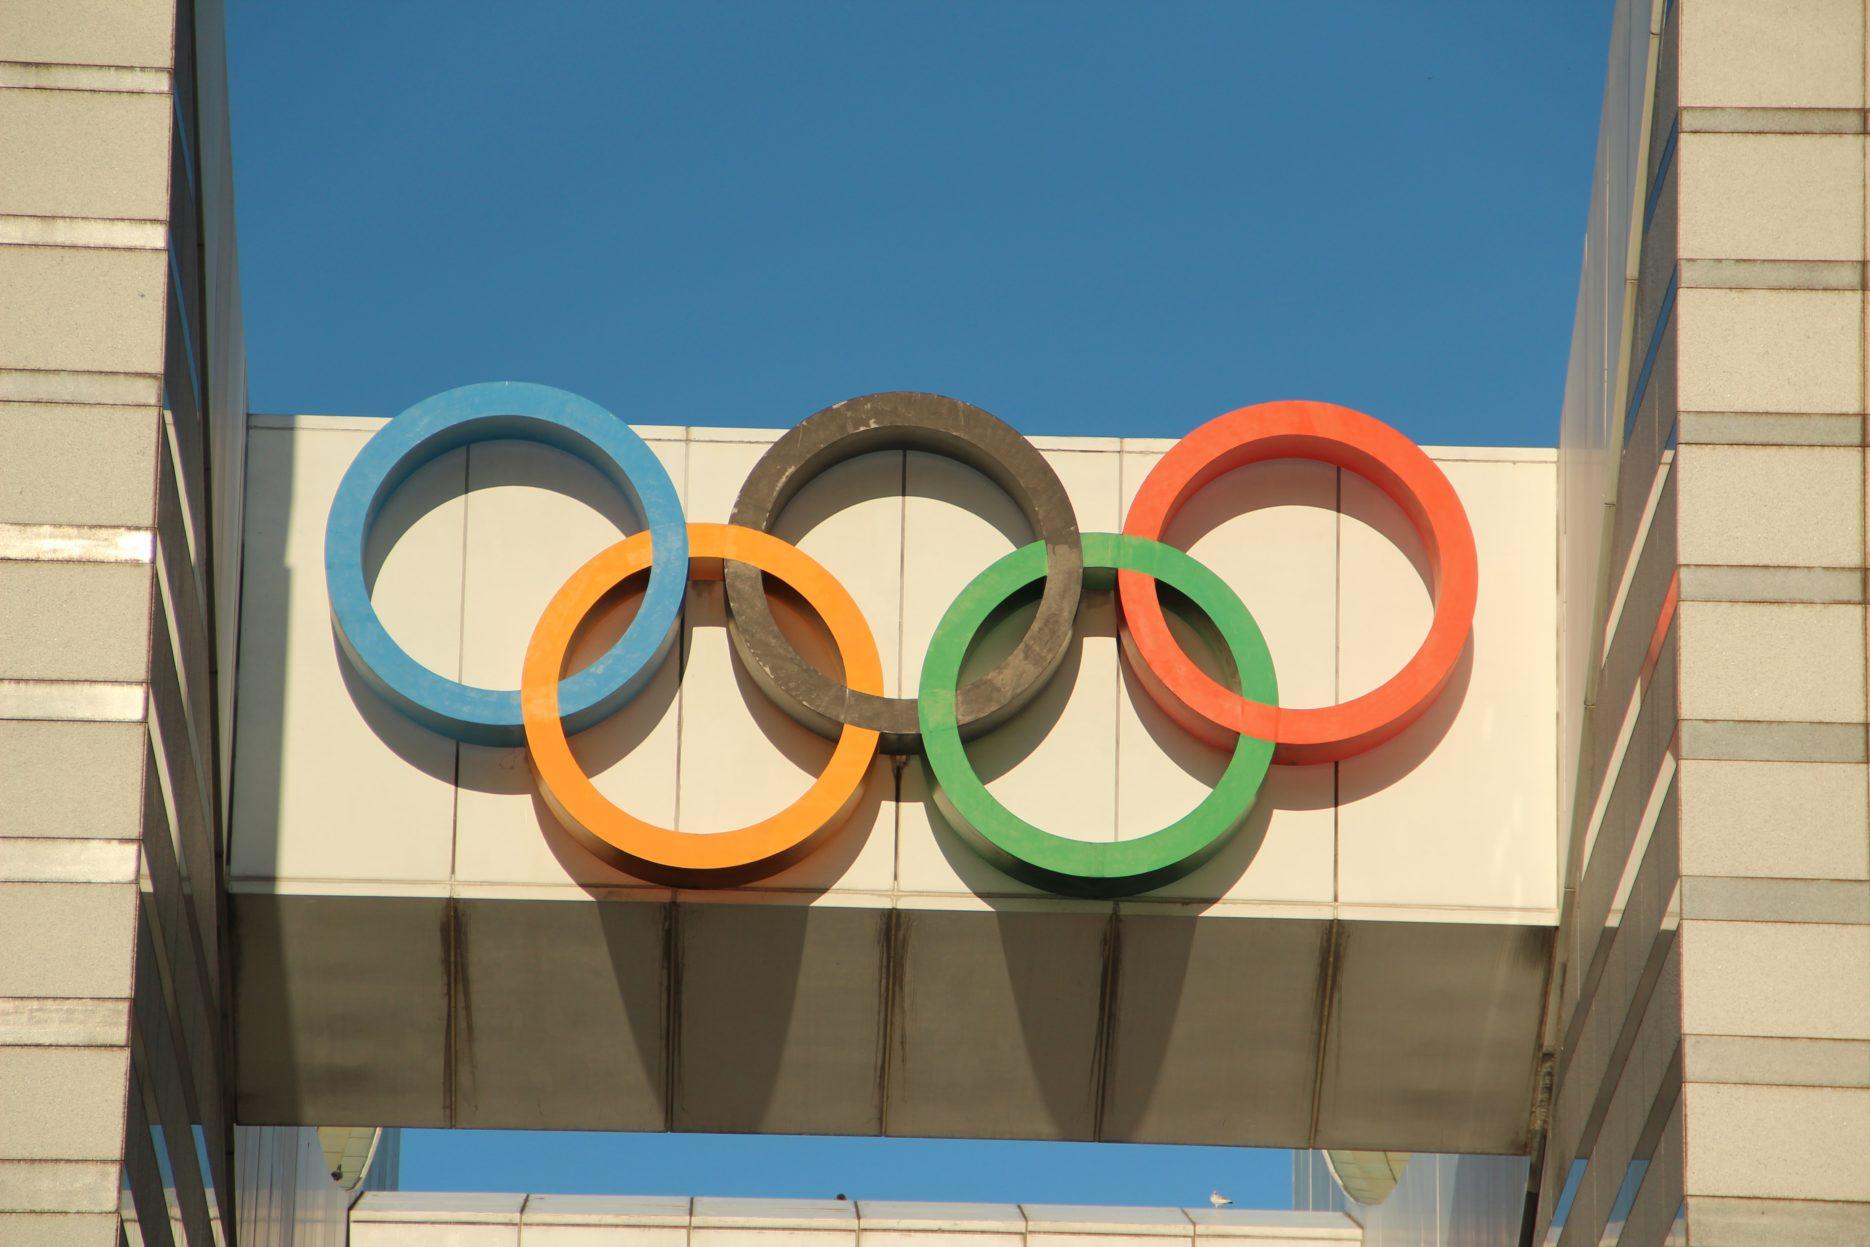 Olympic Rings. Credit: Unsplash